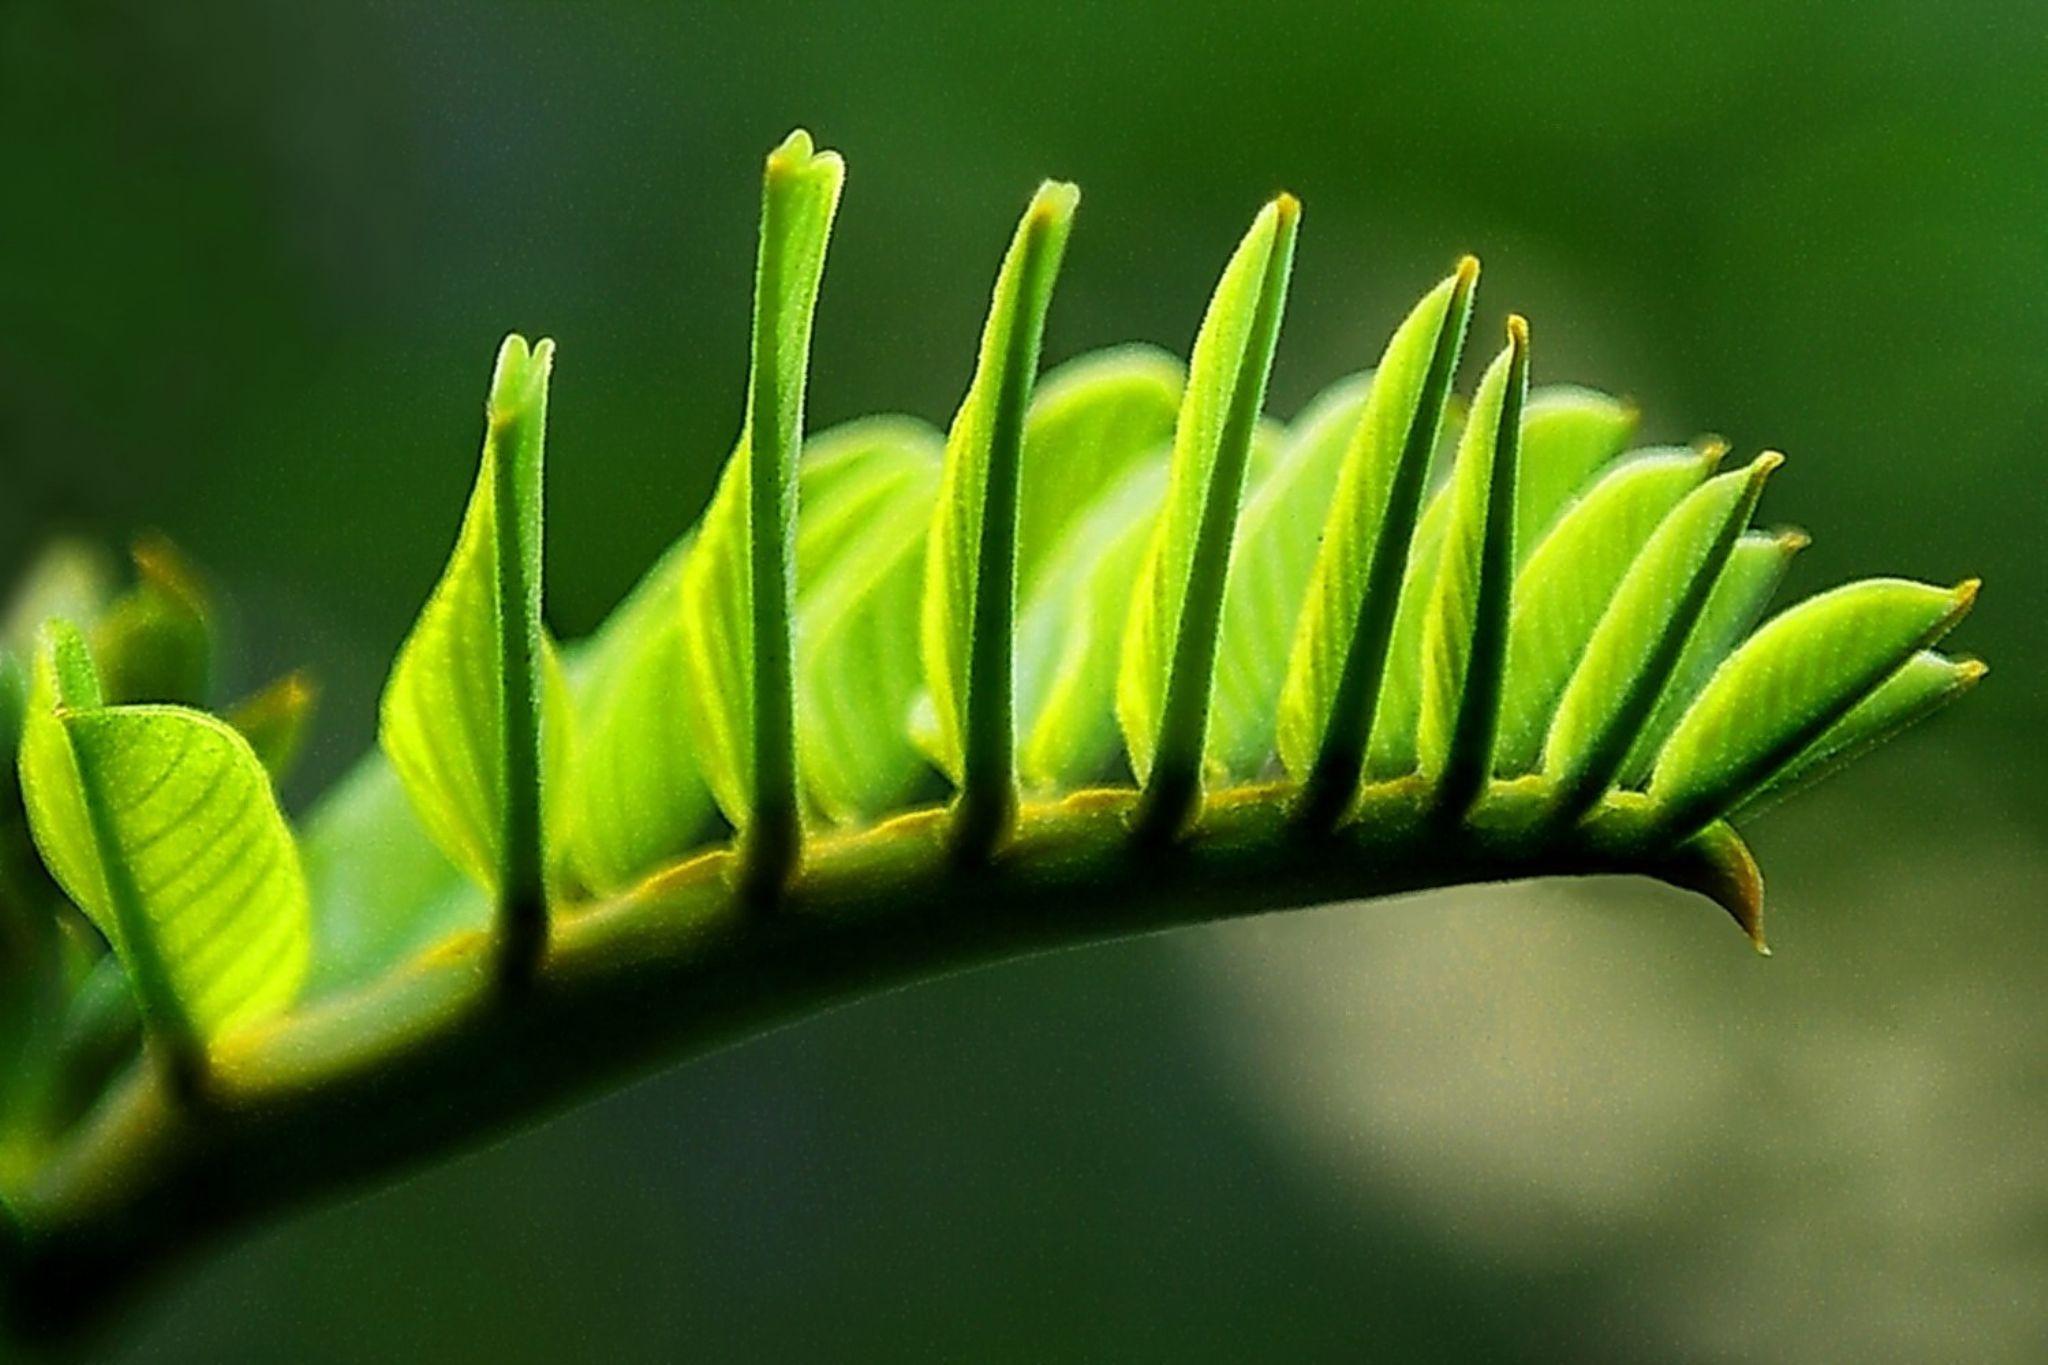 Senna Alata Leaf by Herman Adi